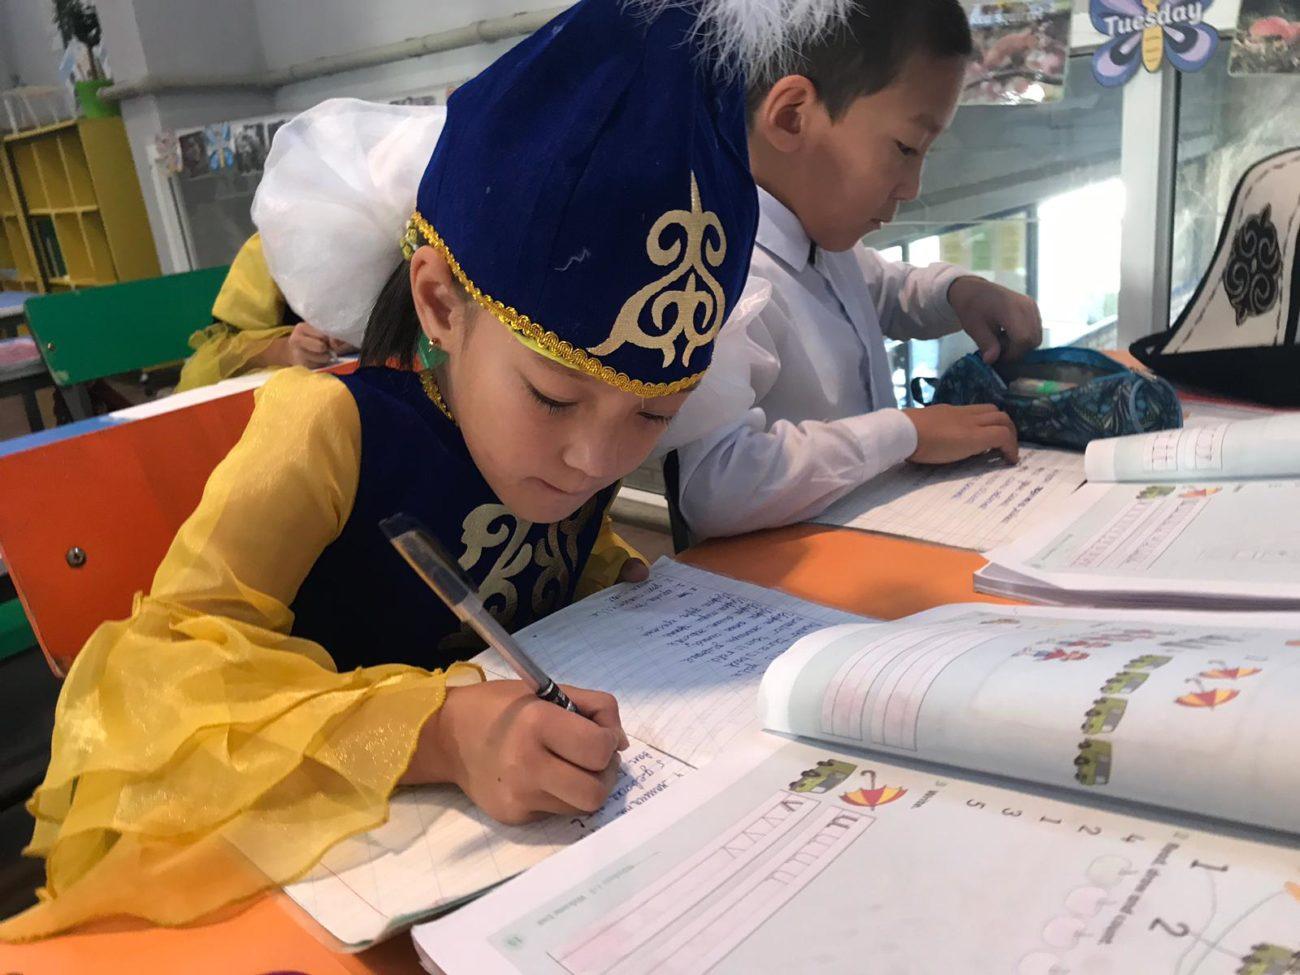 Diktat Kirgistan